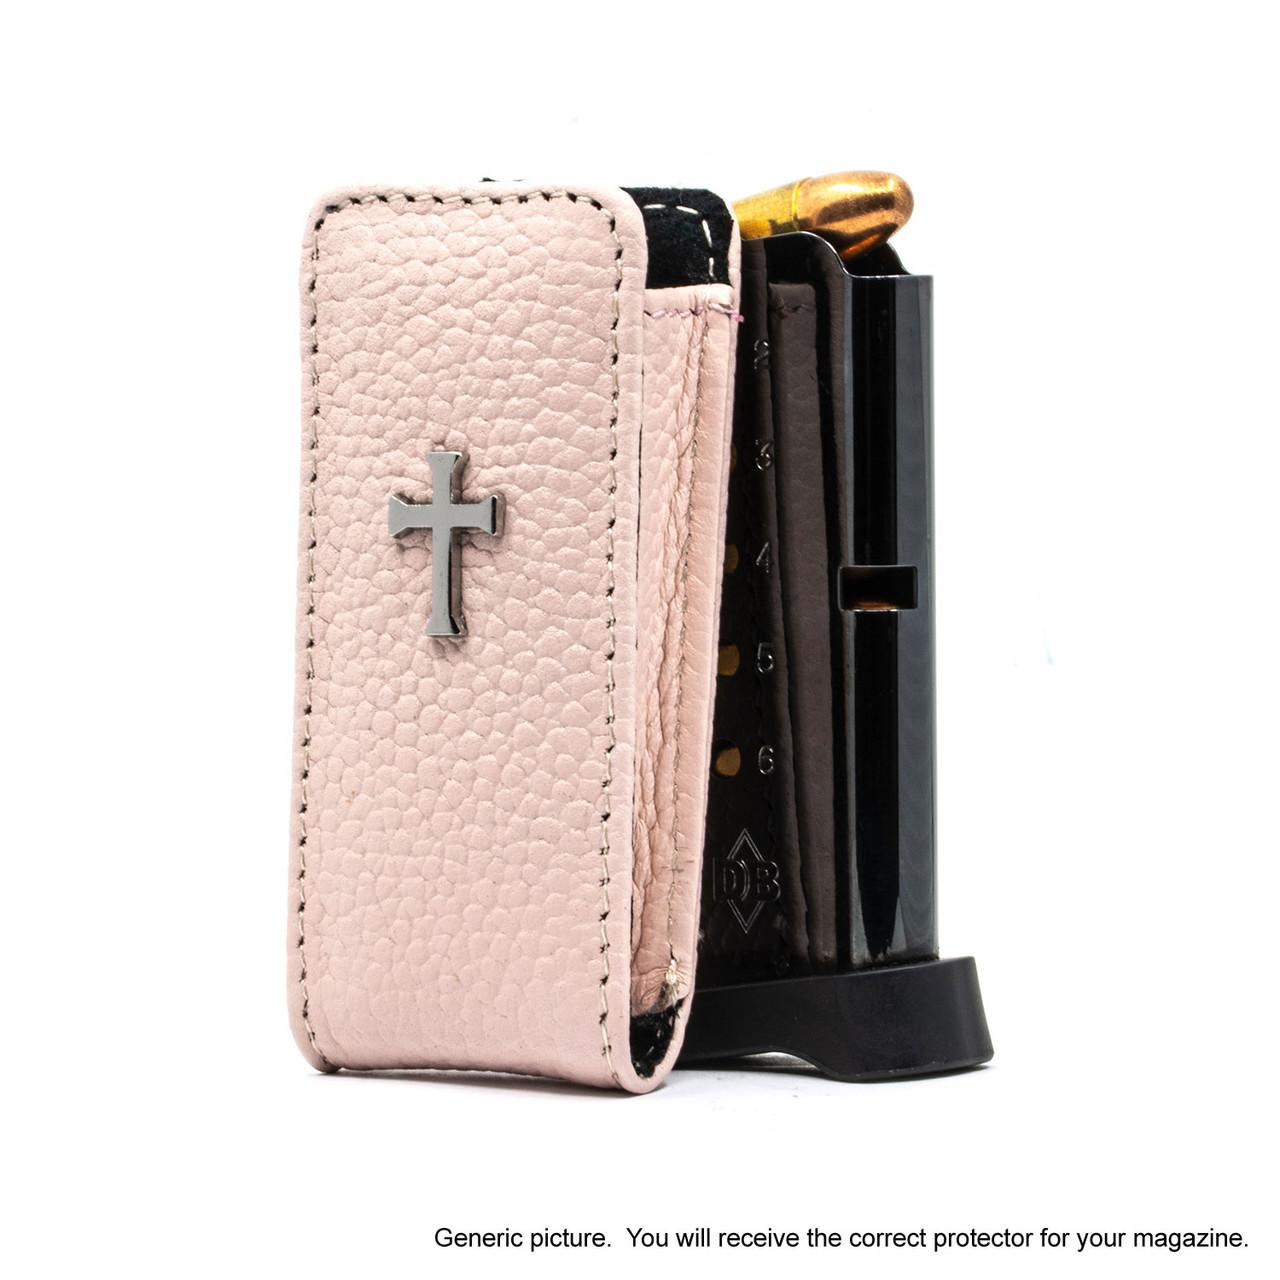 Springfield 911 (.380) Pink Carry Faithfully Cross Magazine Pocket Protector